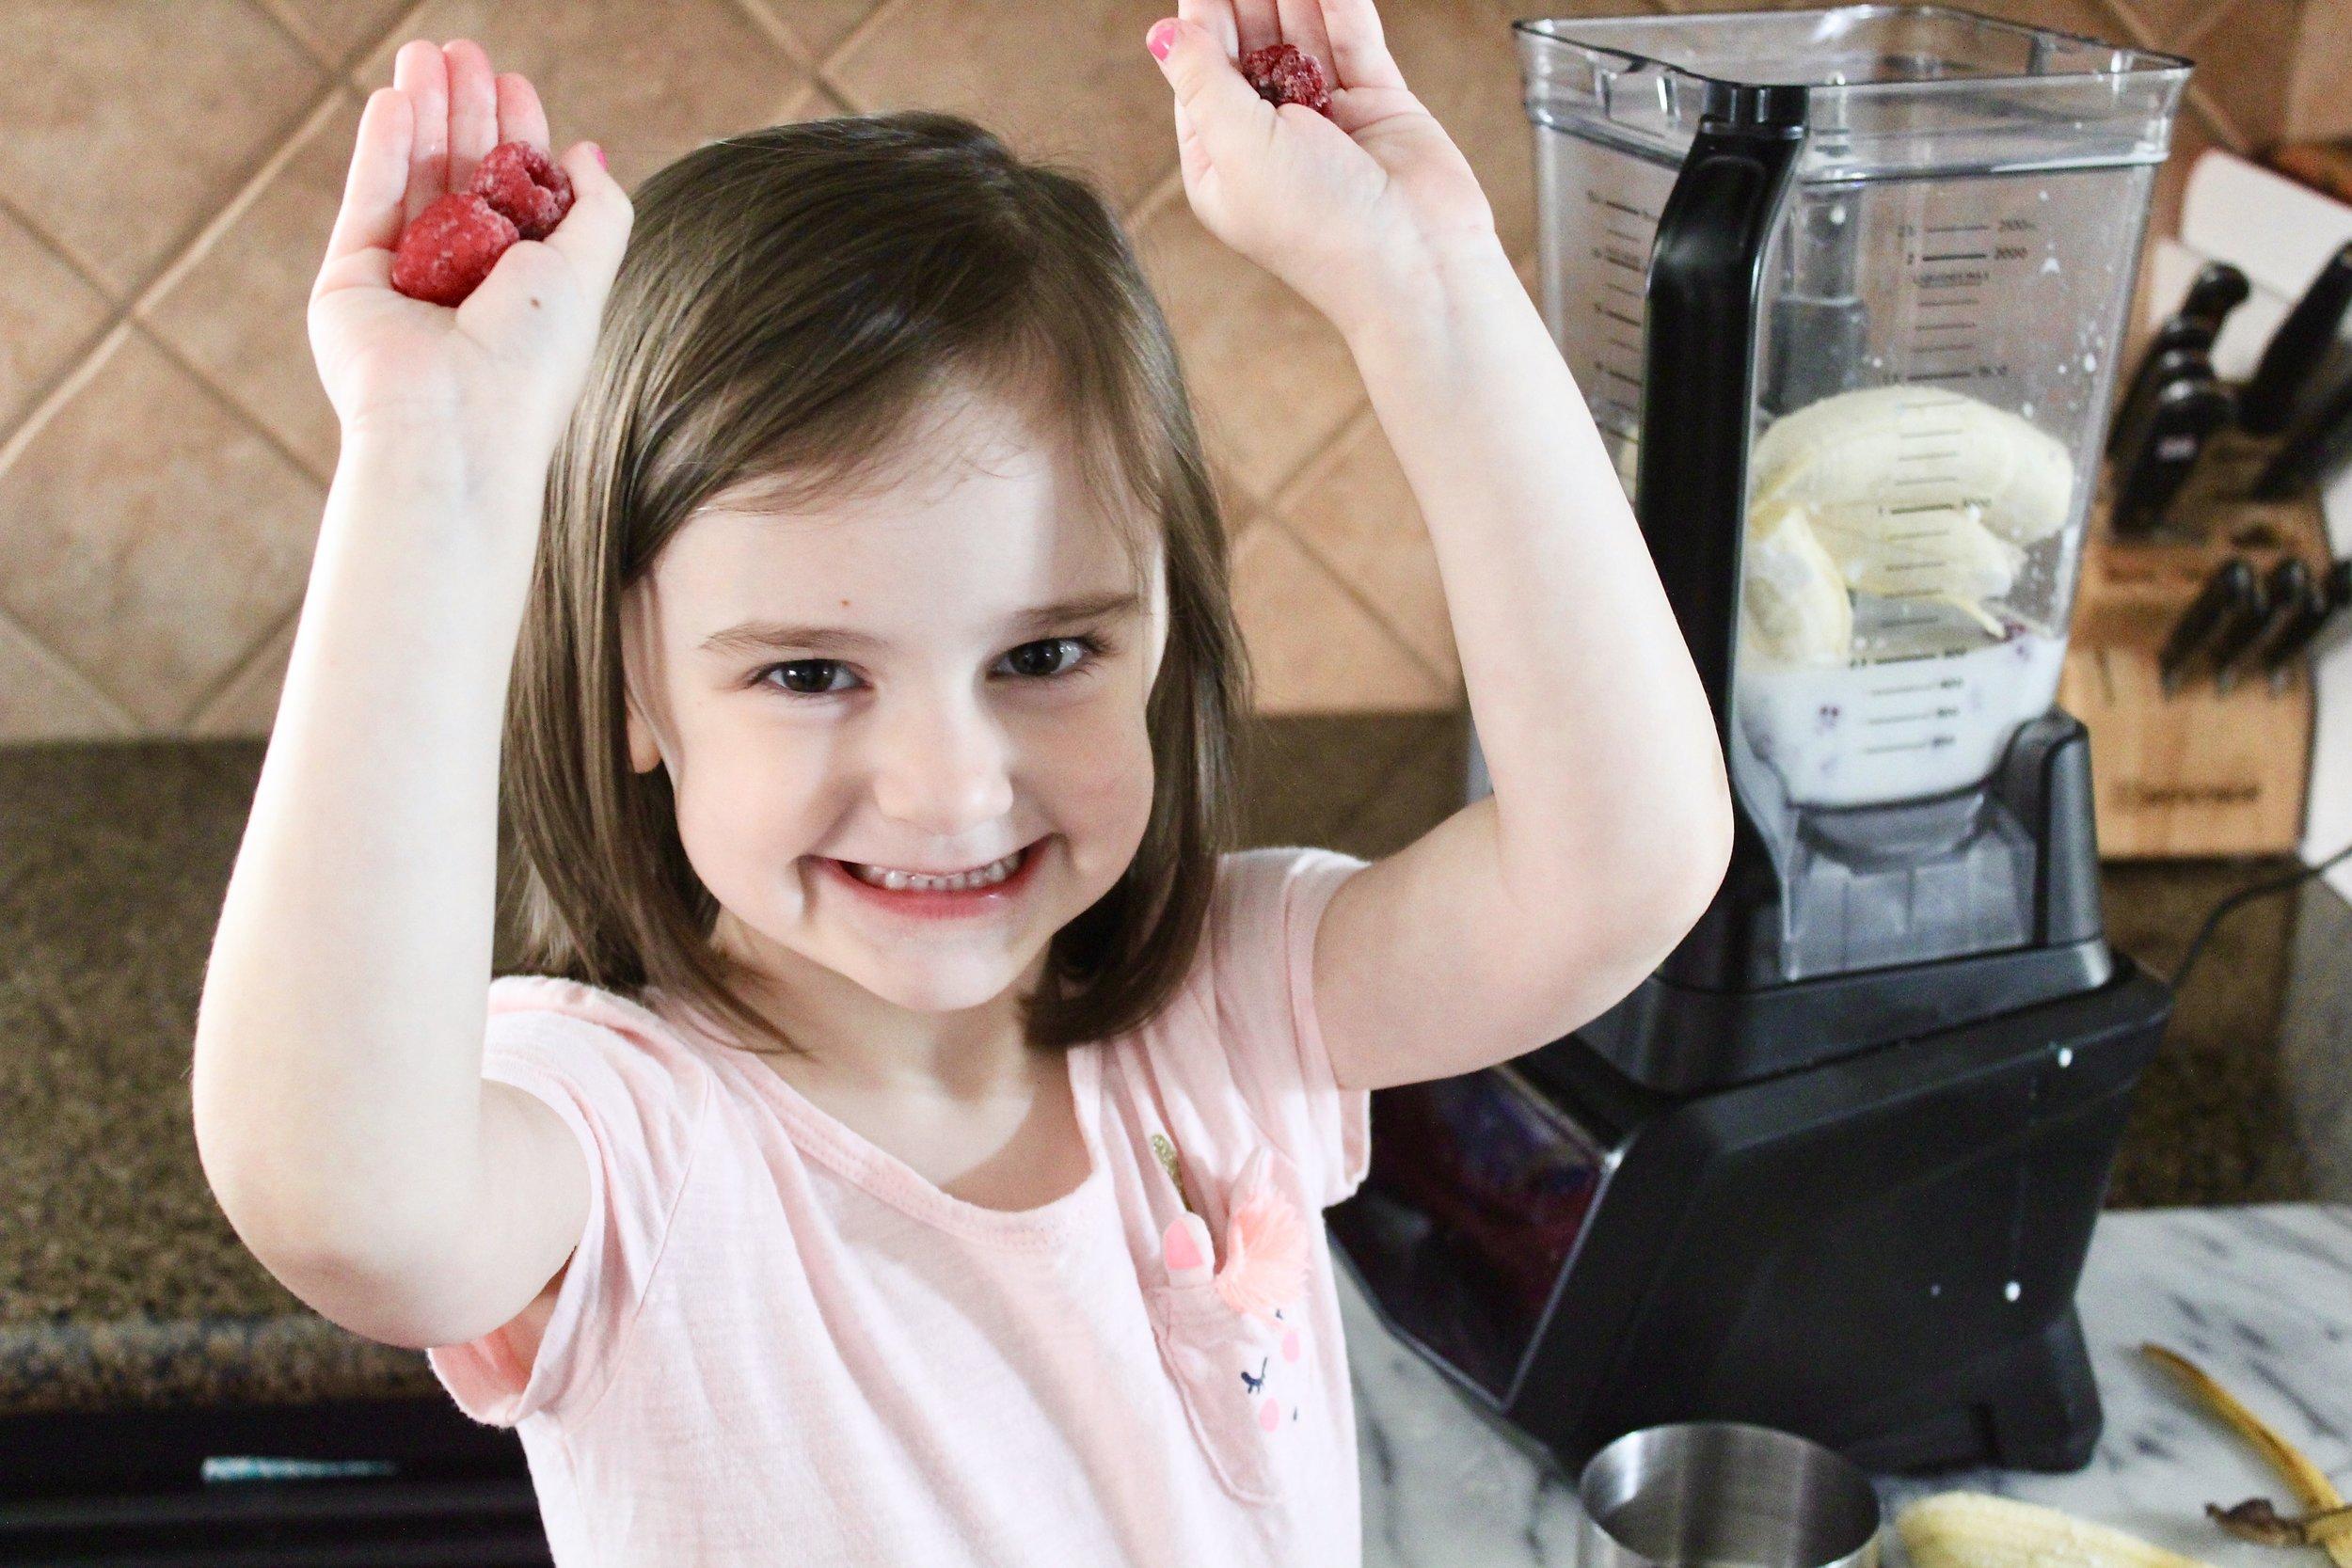 Easy no added sugar raspberry smoothie